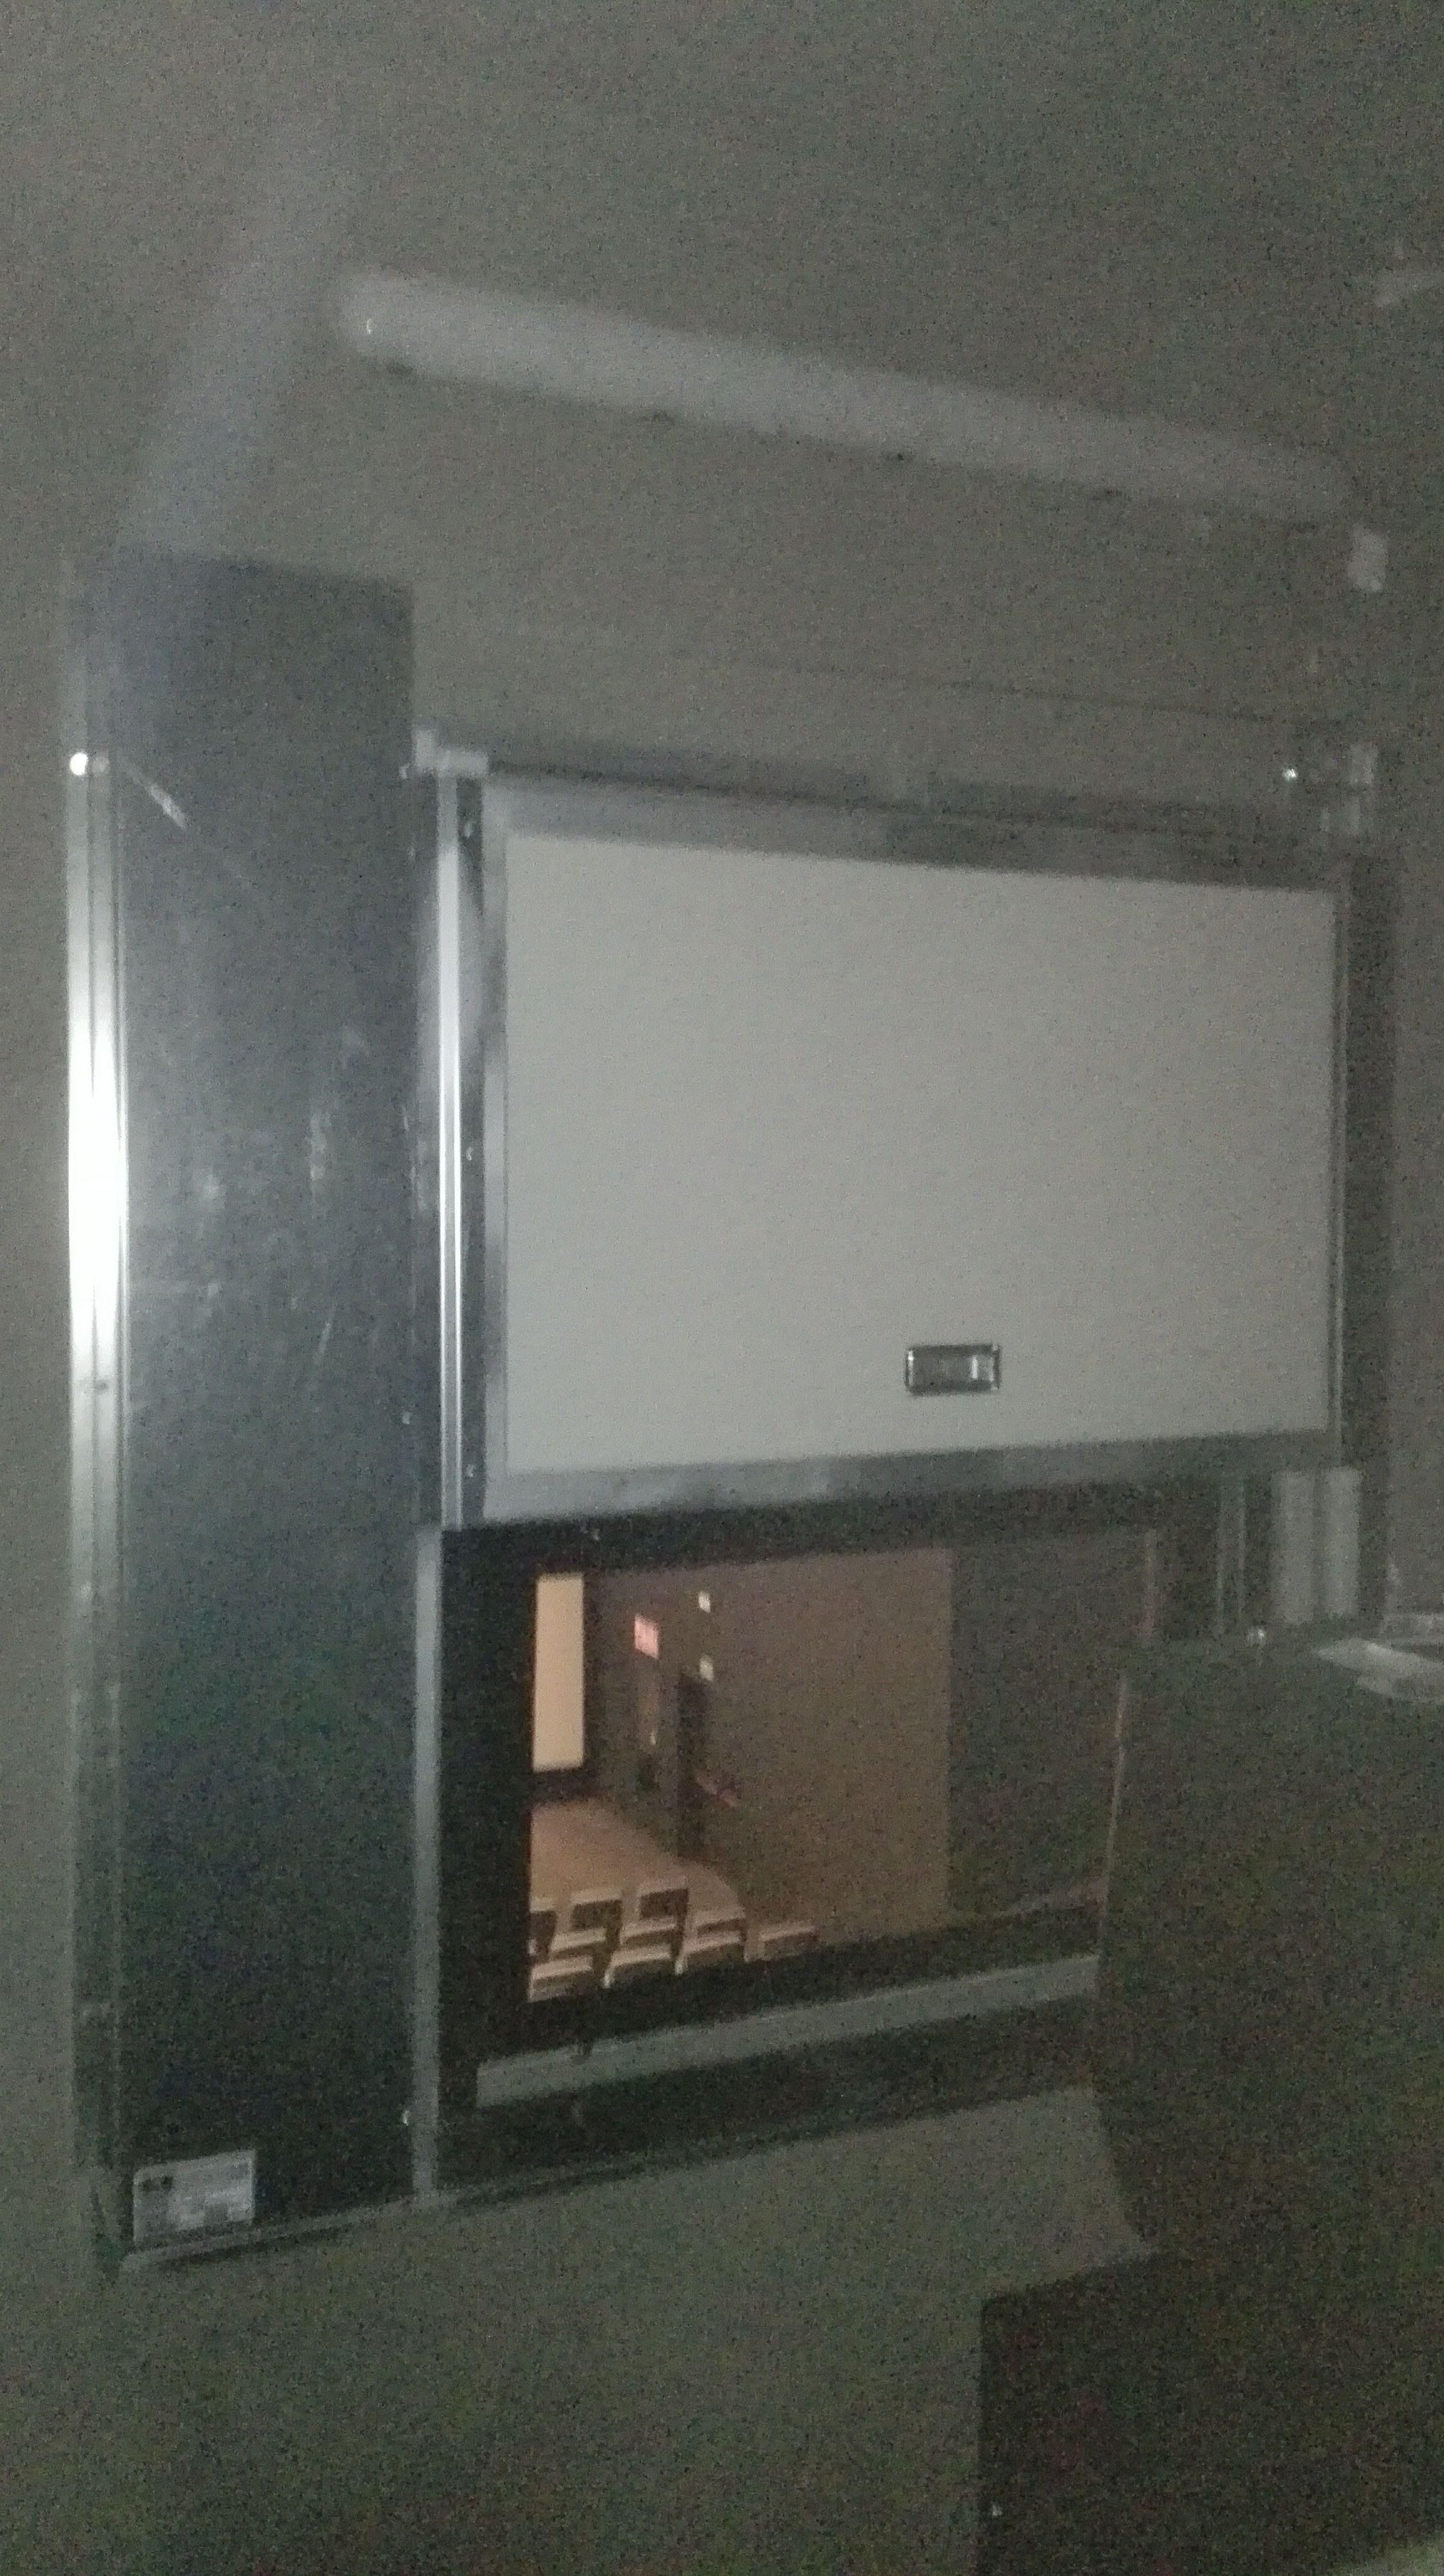 Ventana de guillotina de una hoja contra incendios reproductor de cine